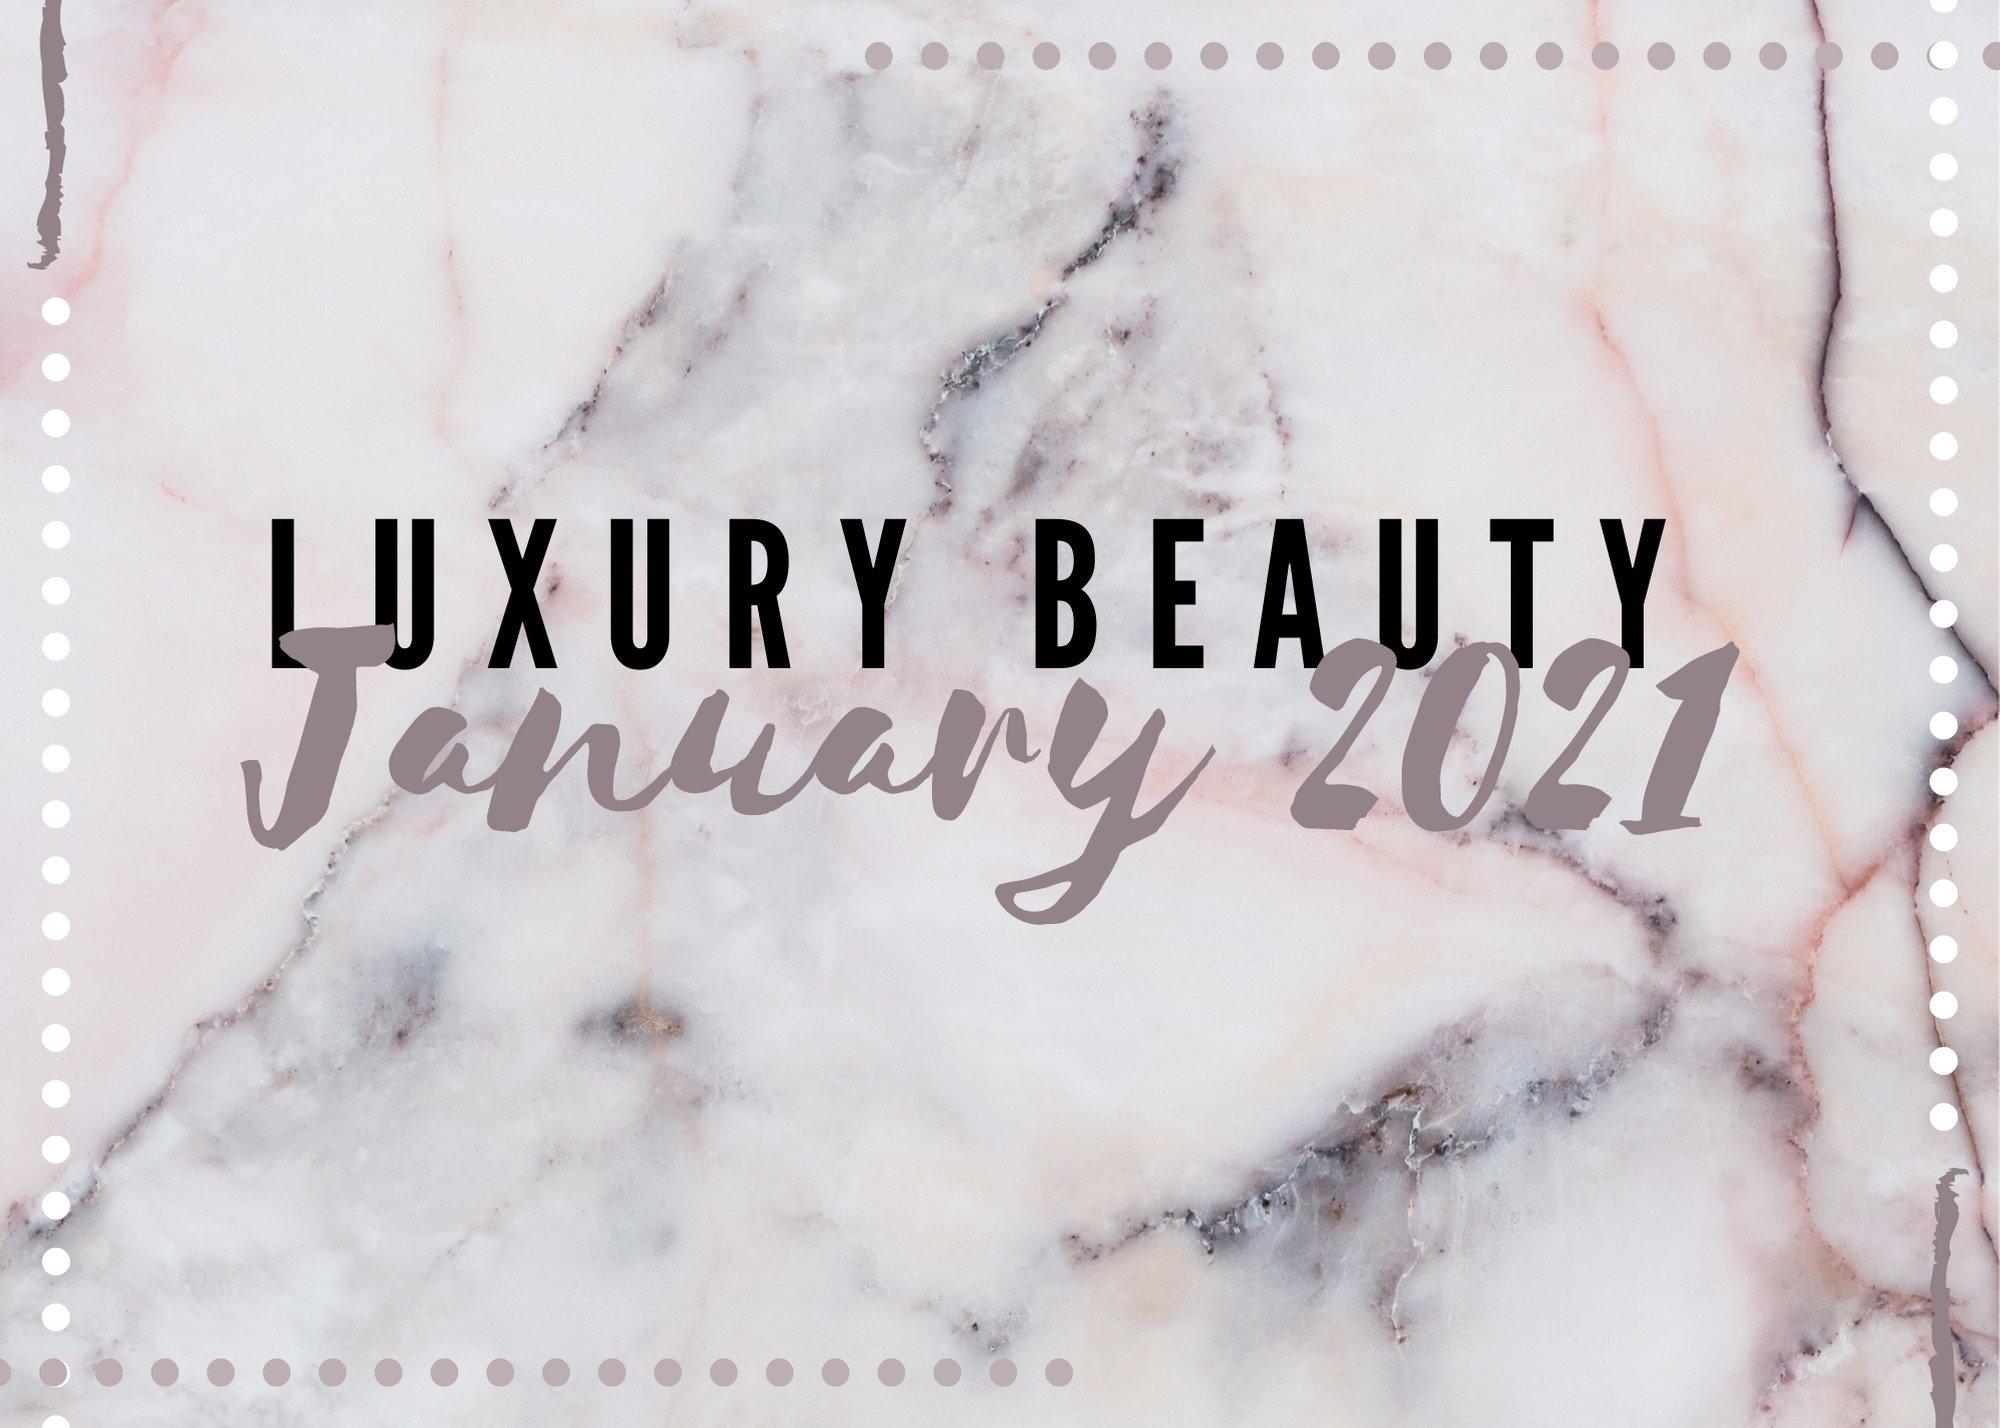 Luxury Beauty Products January 2020